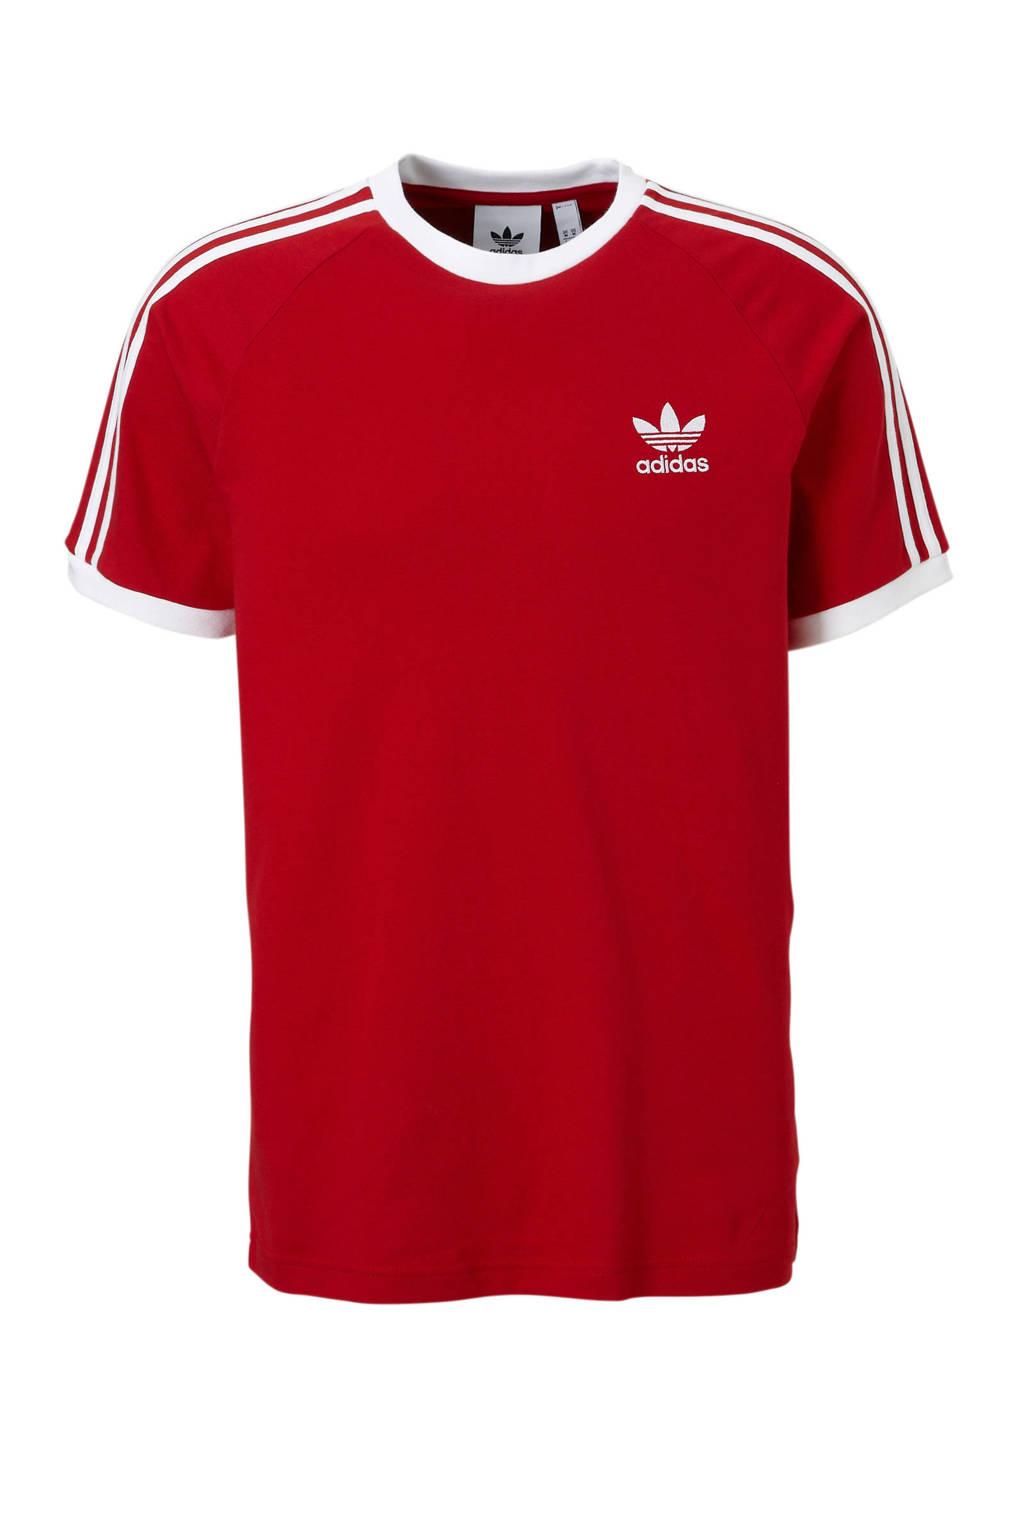 adidas originals   T-shirt rood, Rood/wit